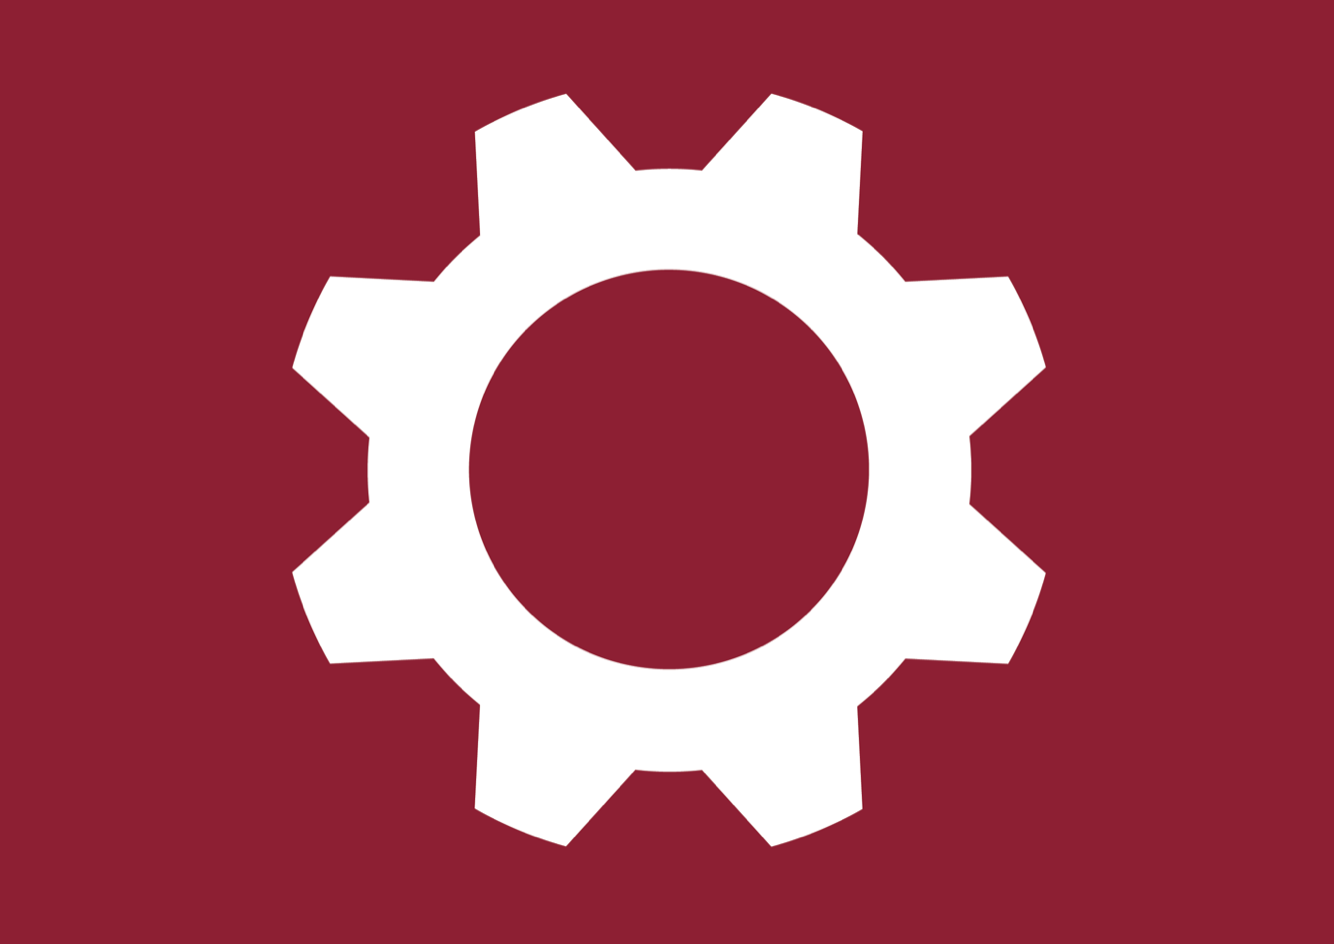 m14 industries